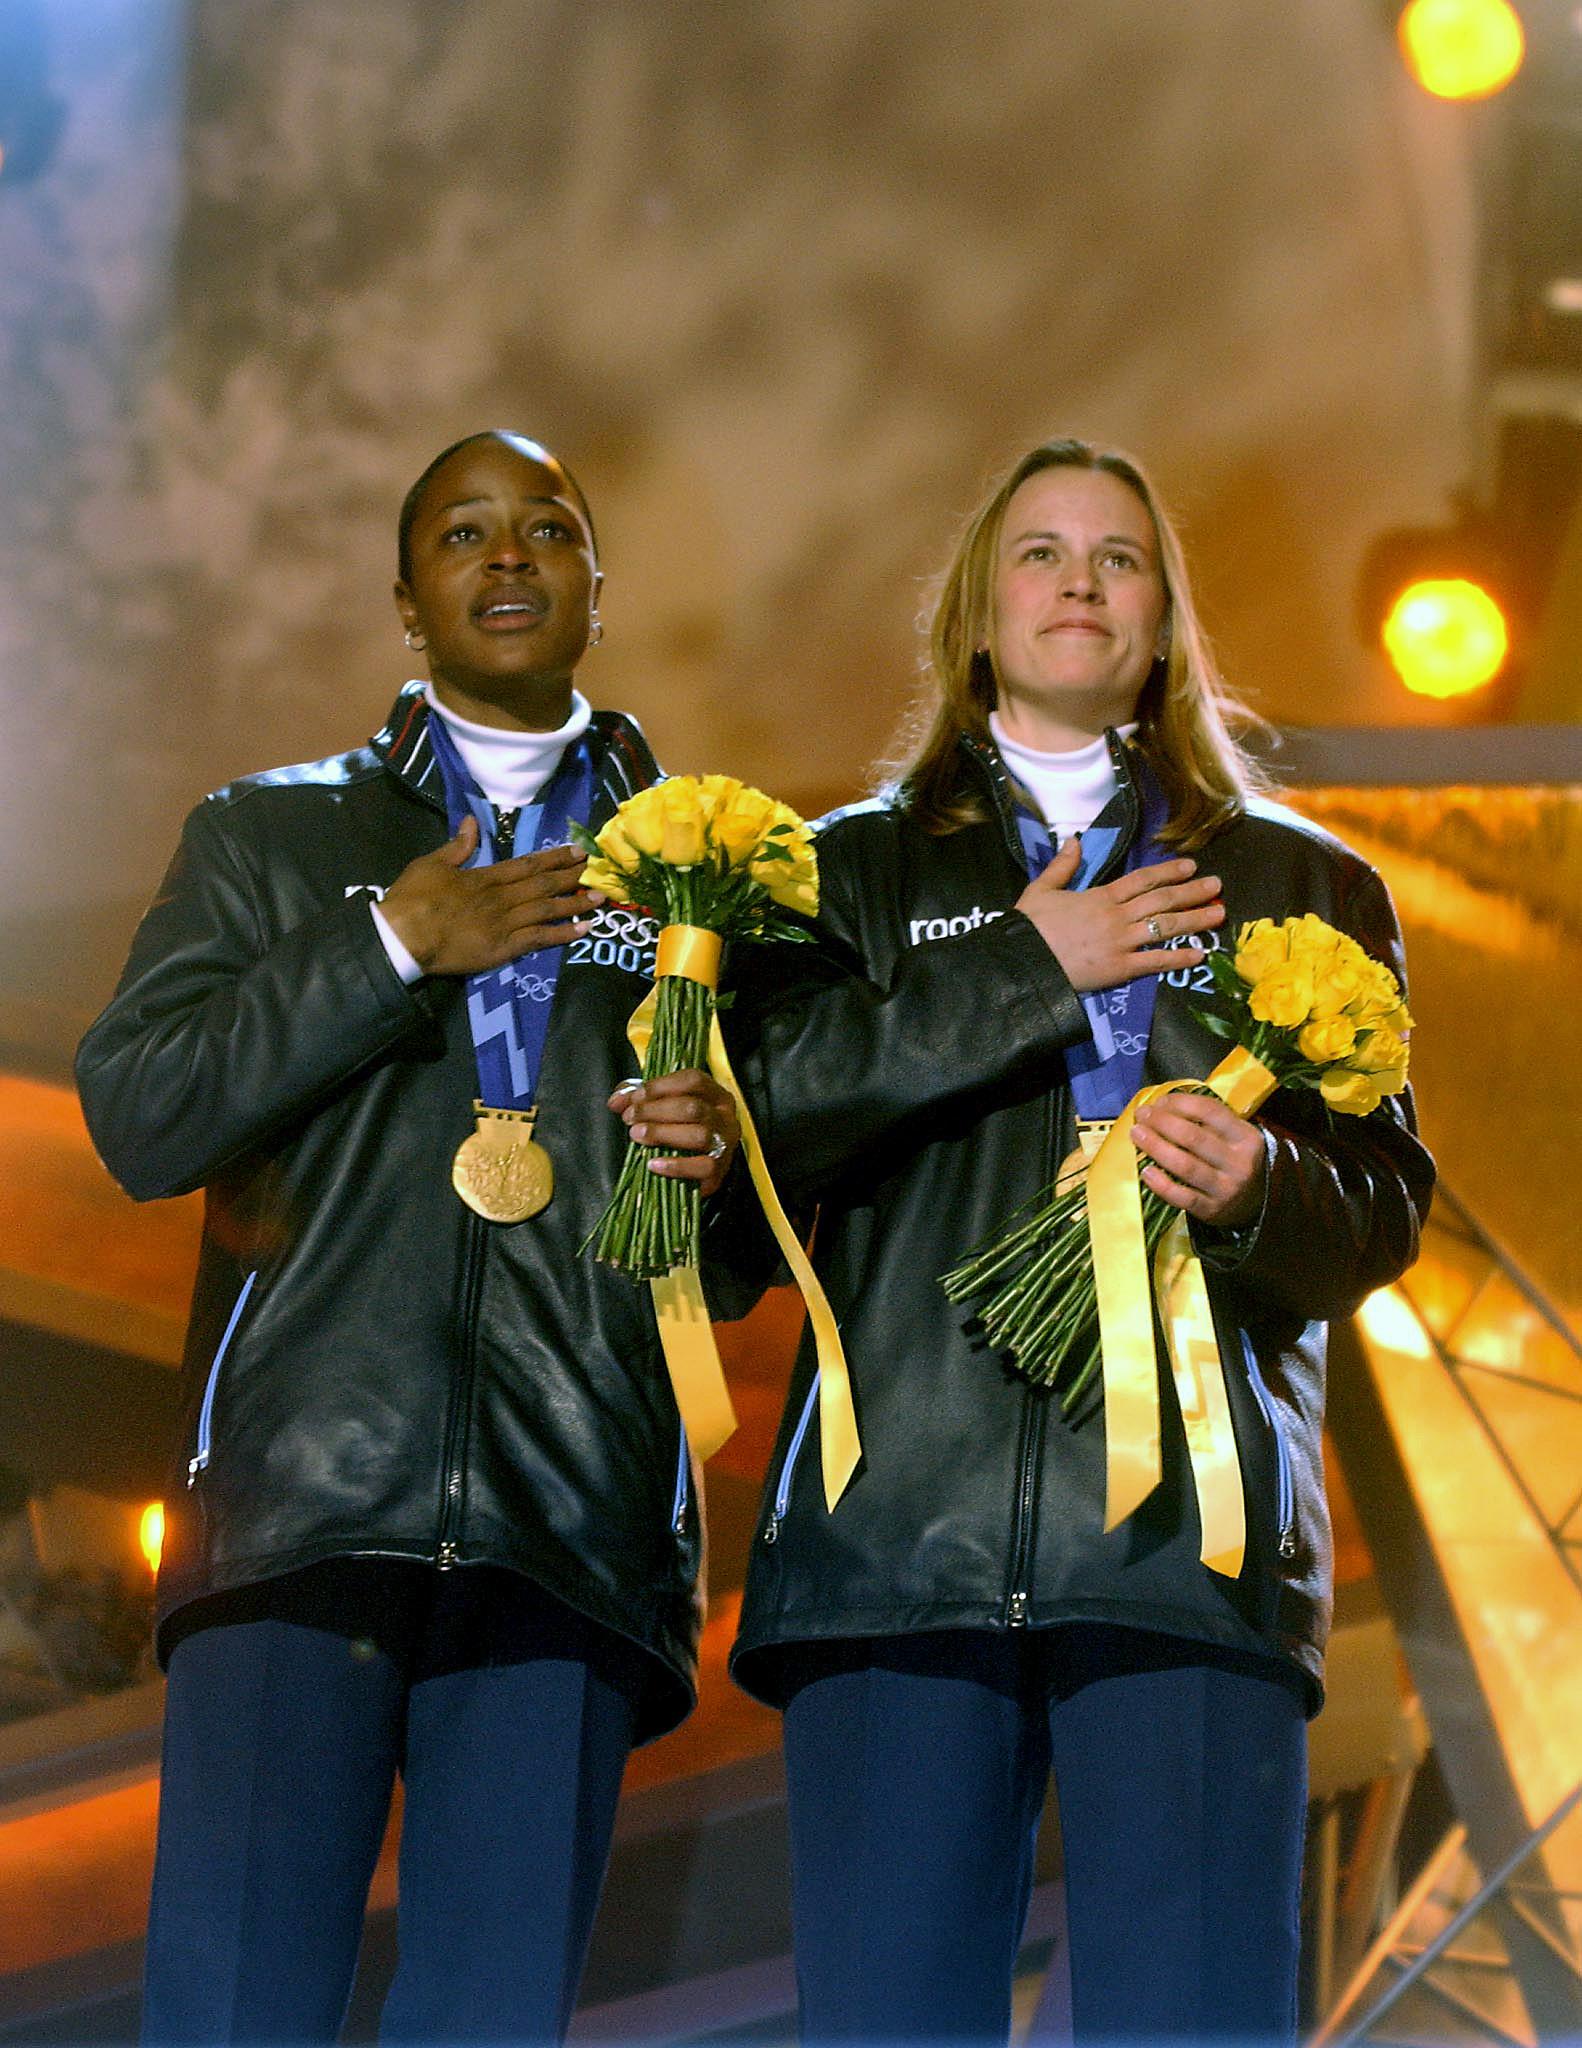 Vonetta Flowers Olympic medal in bobsleigh